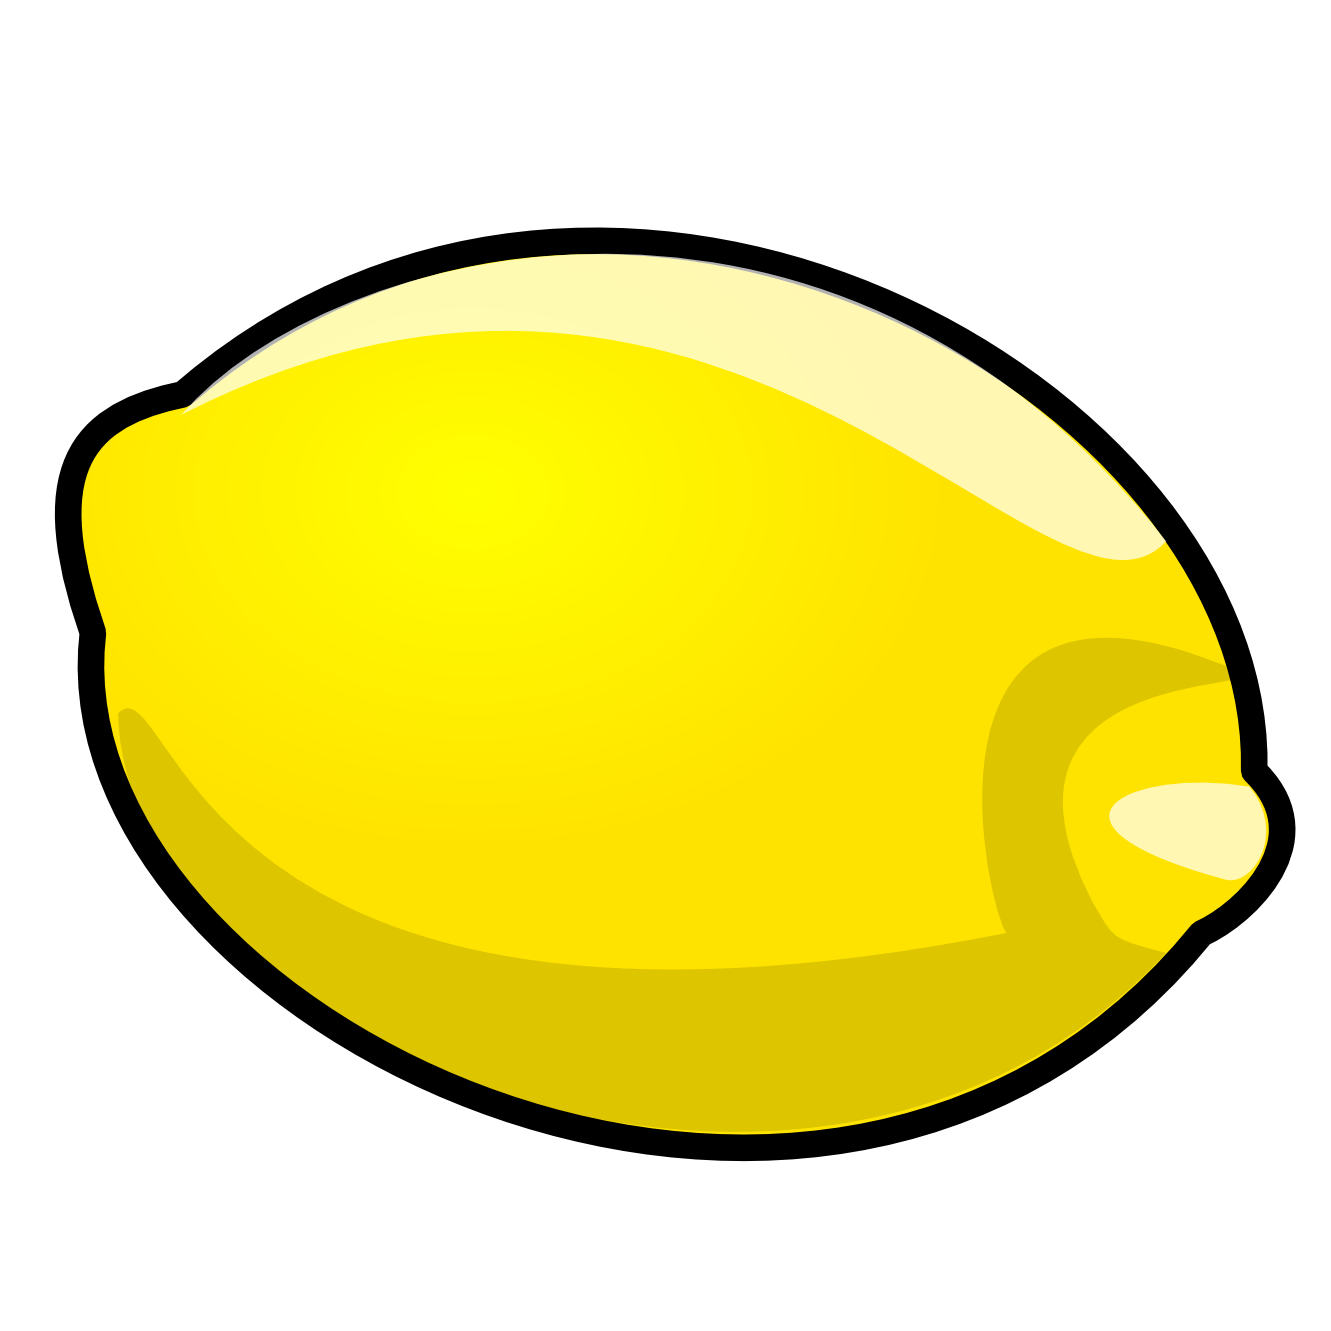 Apple orange lemon clipart image free library Lemon Clip Art Free   Clipart Panda - Free Clipart Images image free library